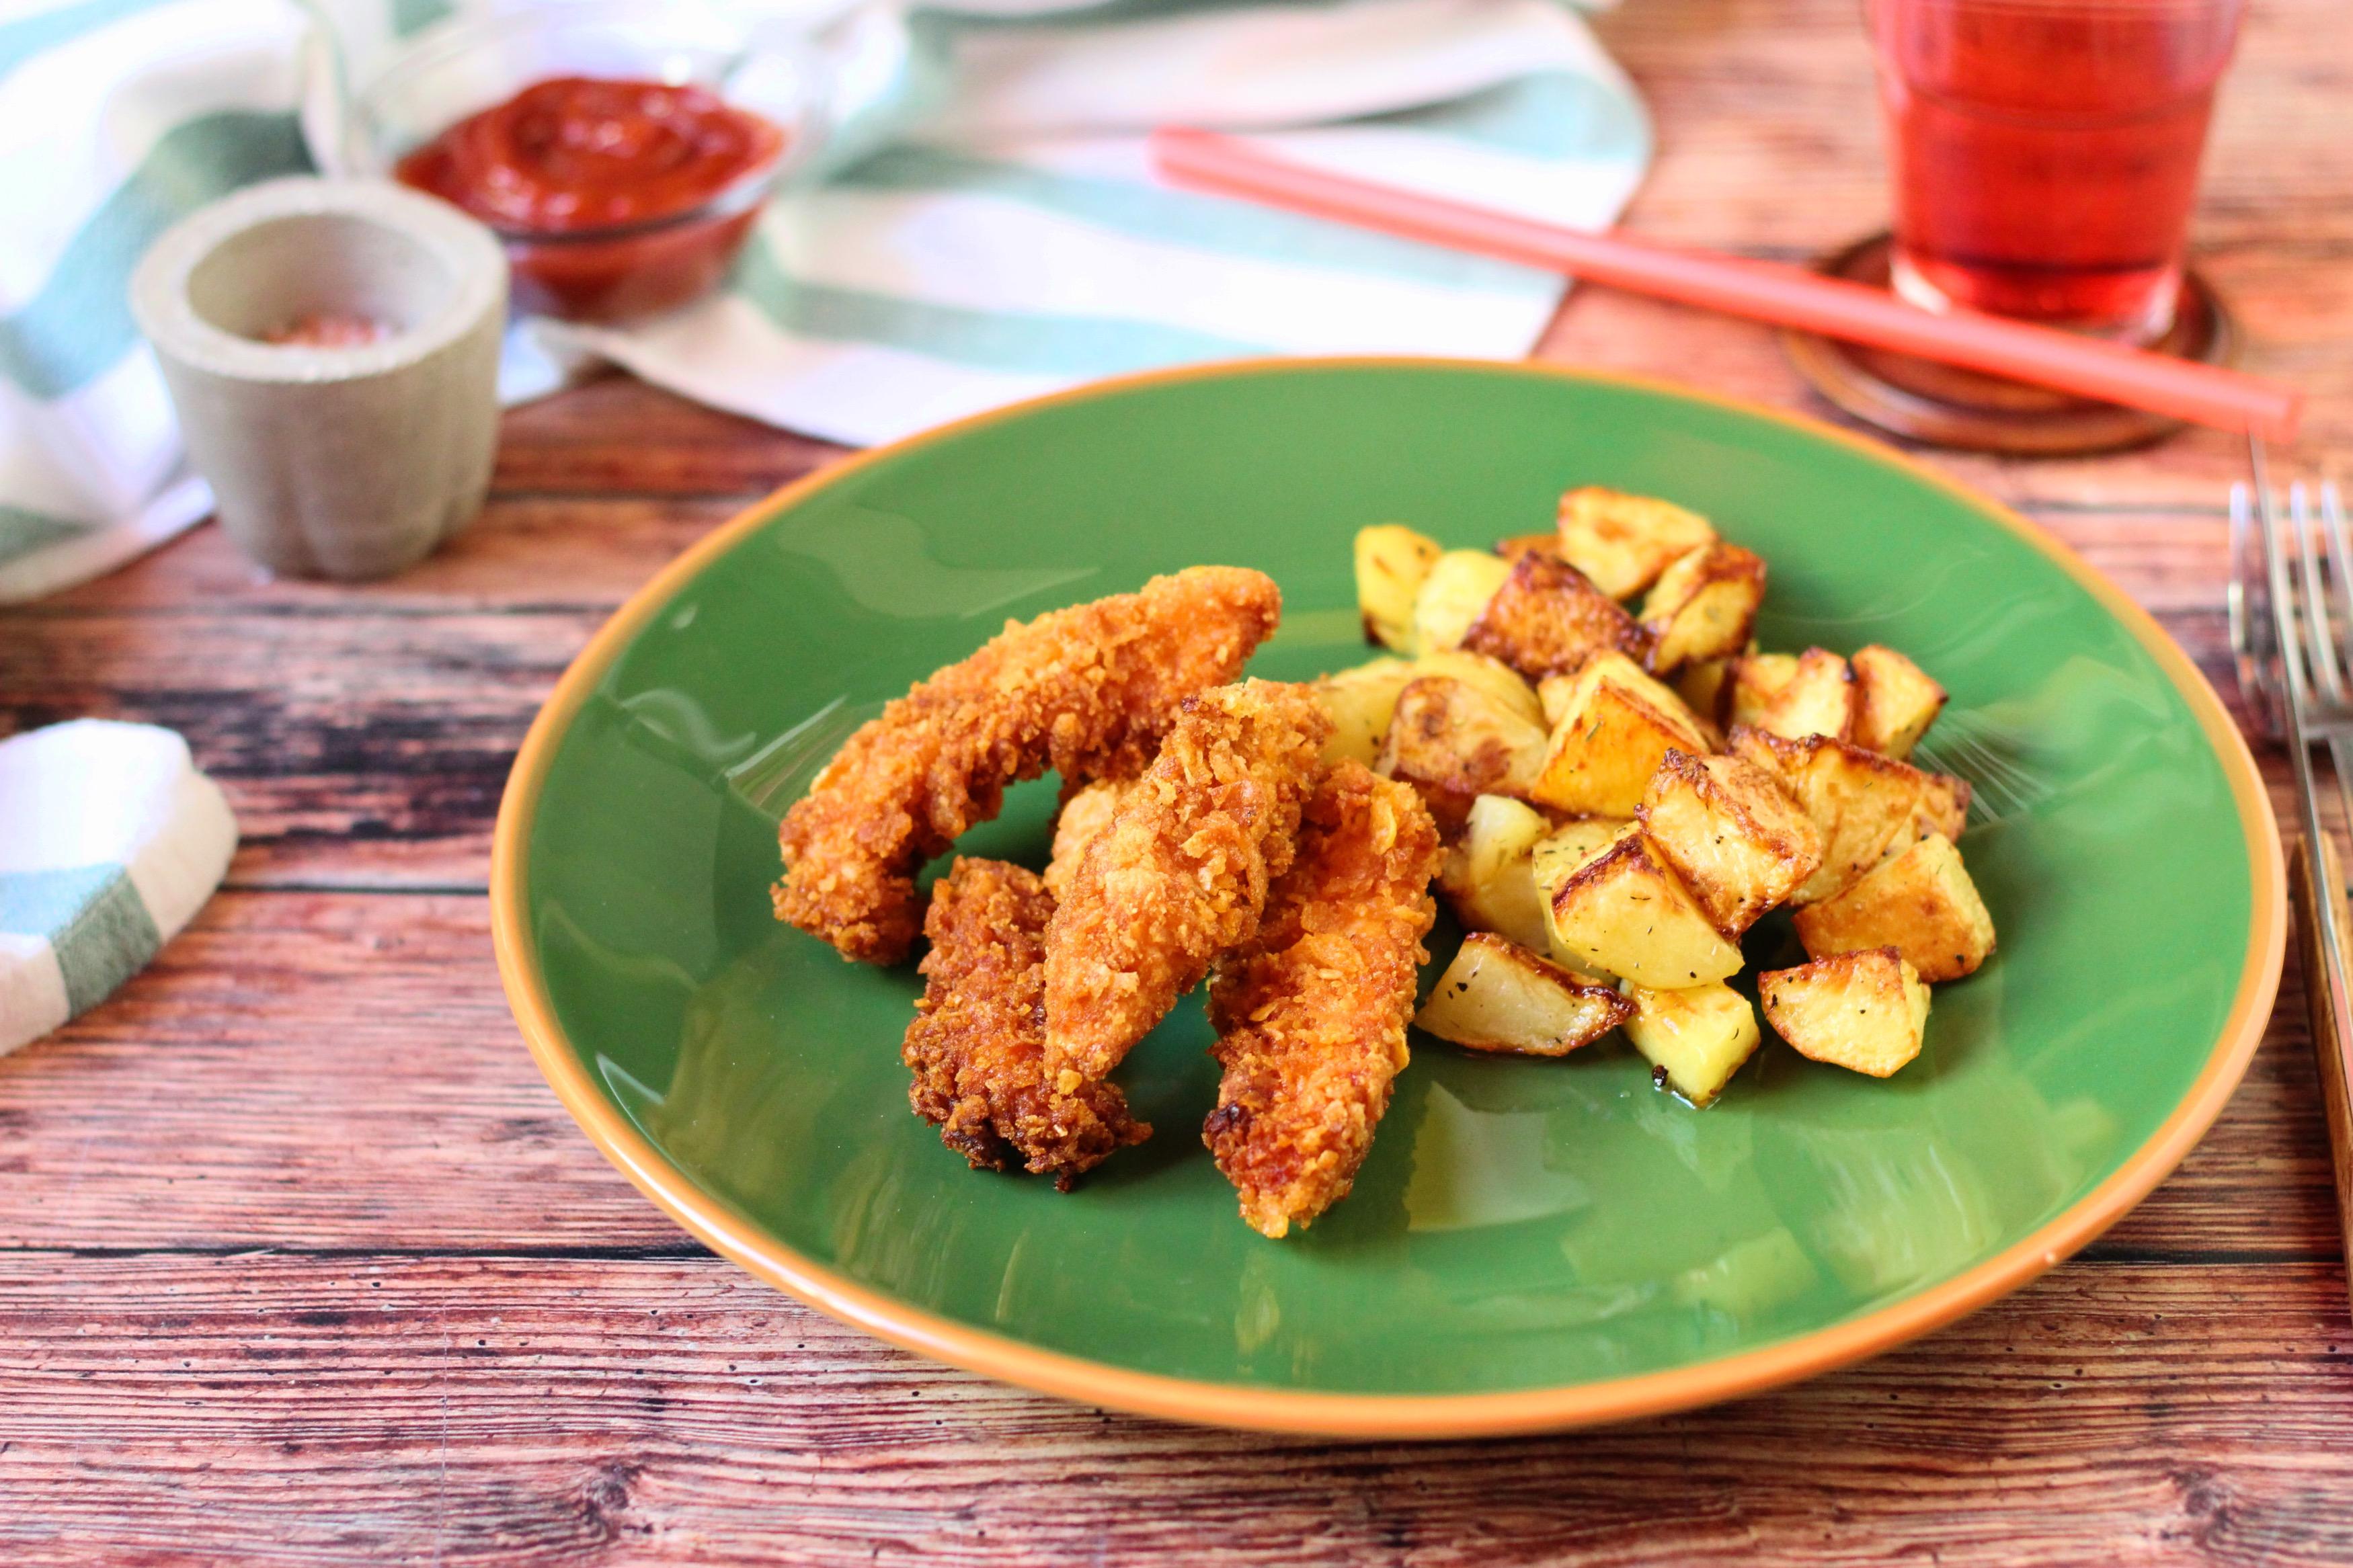 Csirke kukorica bundában